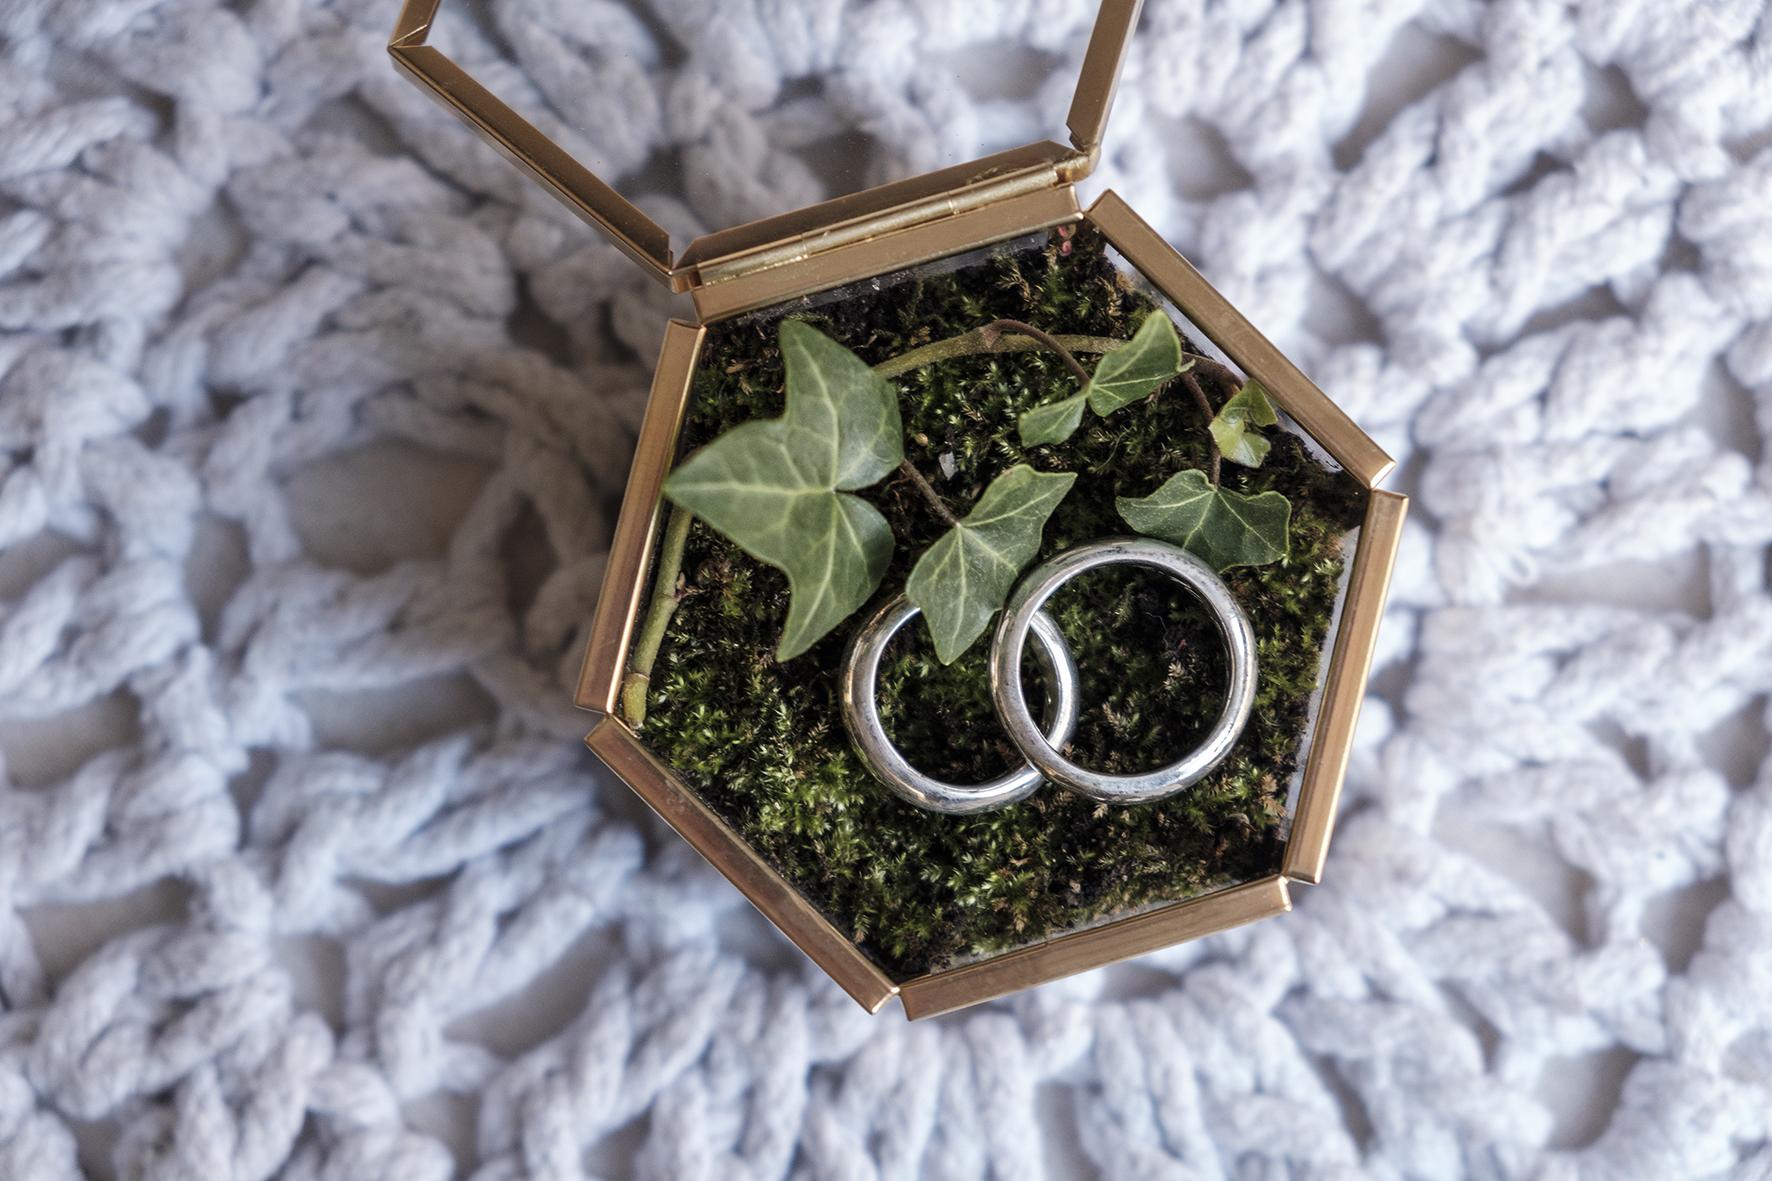 matrimonio tema verde la scatola porta fedi vetro e elementi vegetali